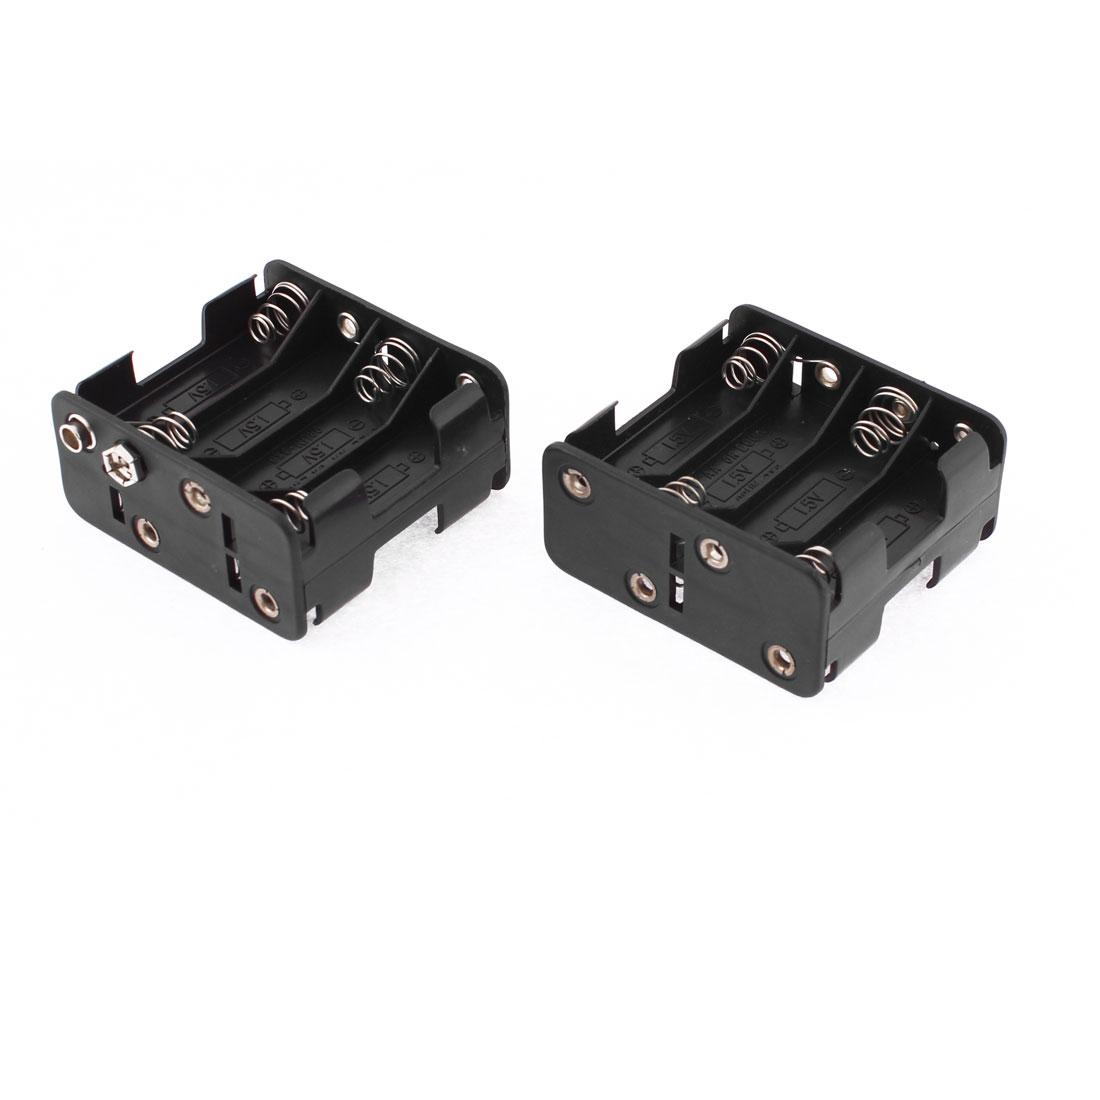 2 Pcs Plastic Double Sided 8 x 1.5V AA Battery Holder Box Case Black